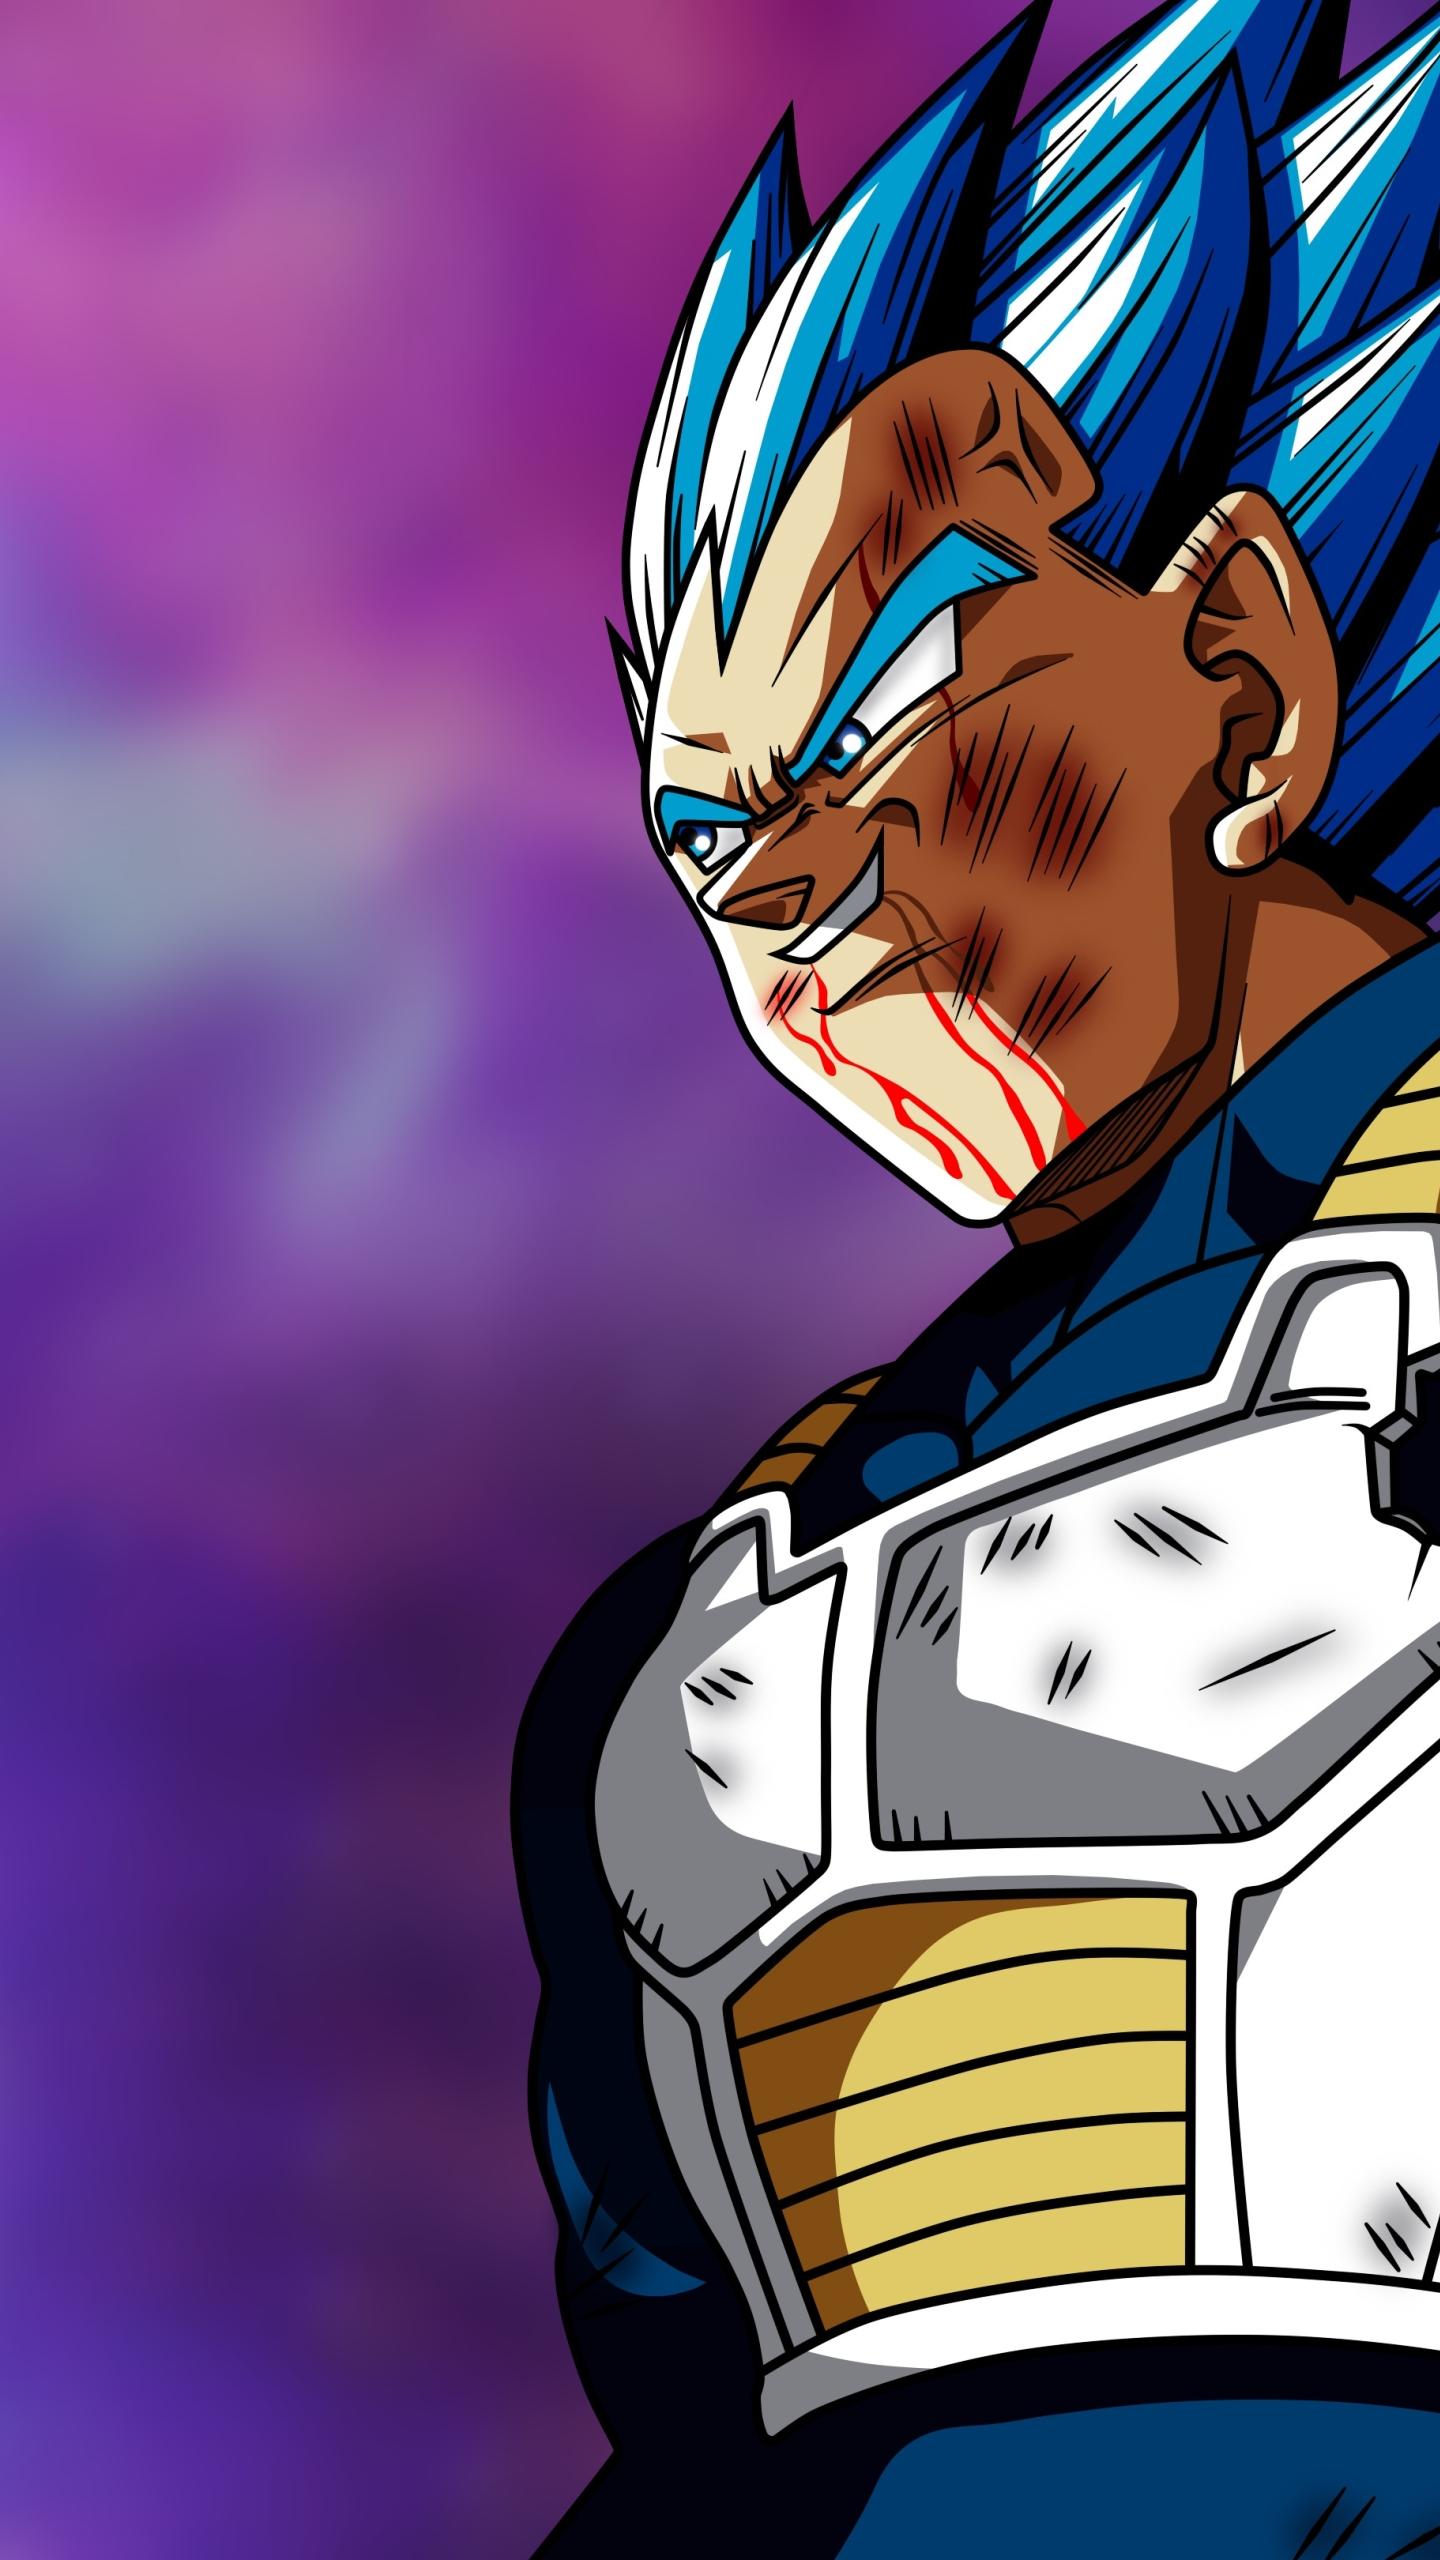 Vegeta Dragon Ball Goku, HD 8K Wallpaper